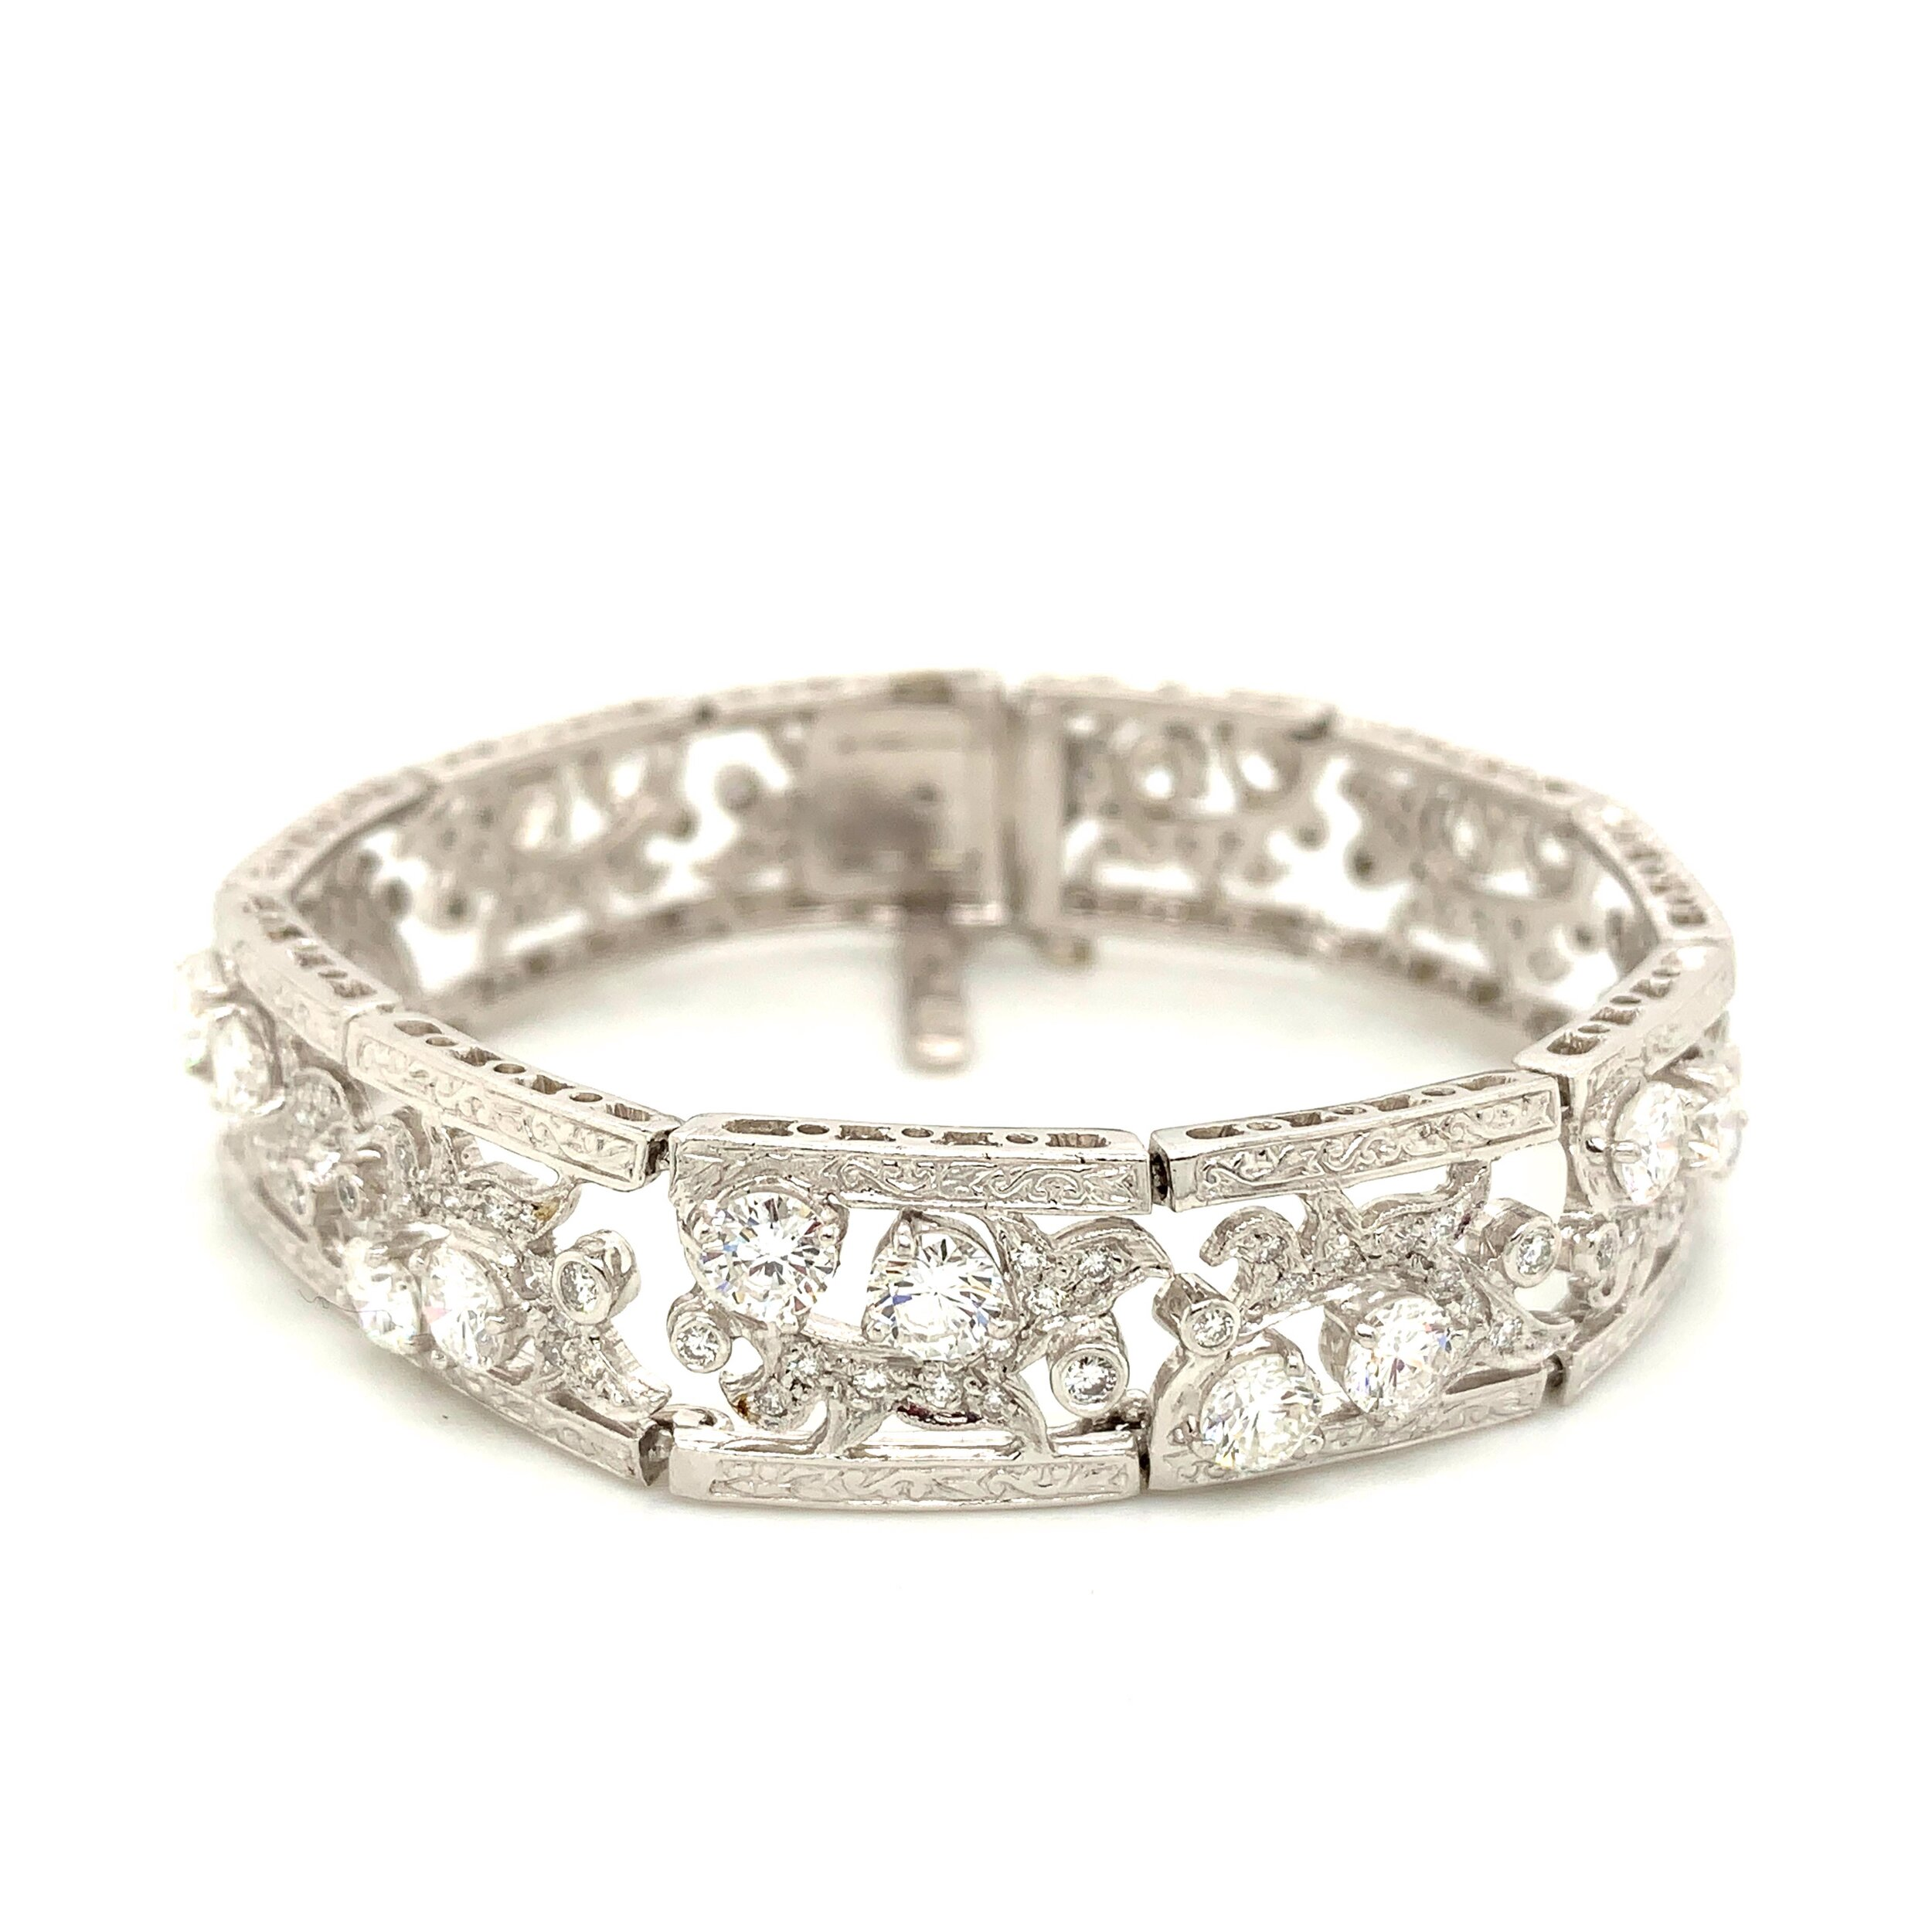 Platinum Bracelet with Diamonds  Est. US$ 8,500-10,000